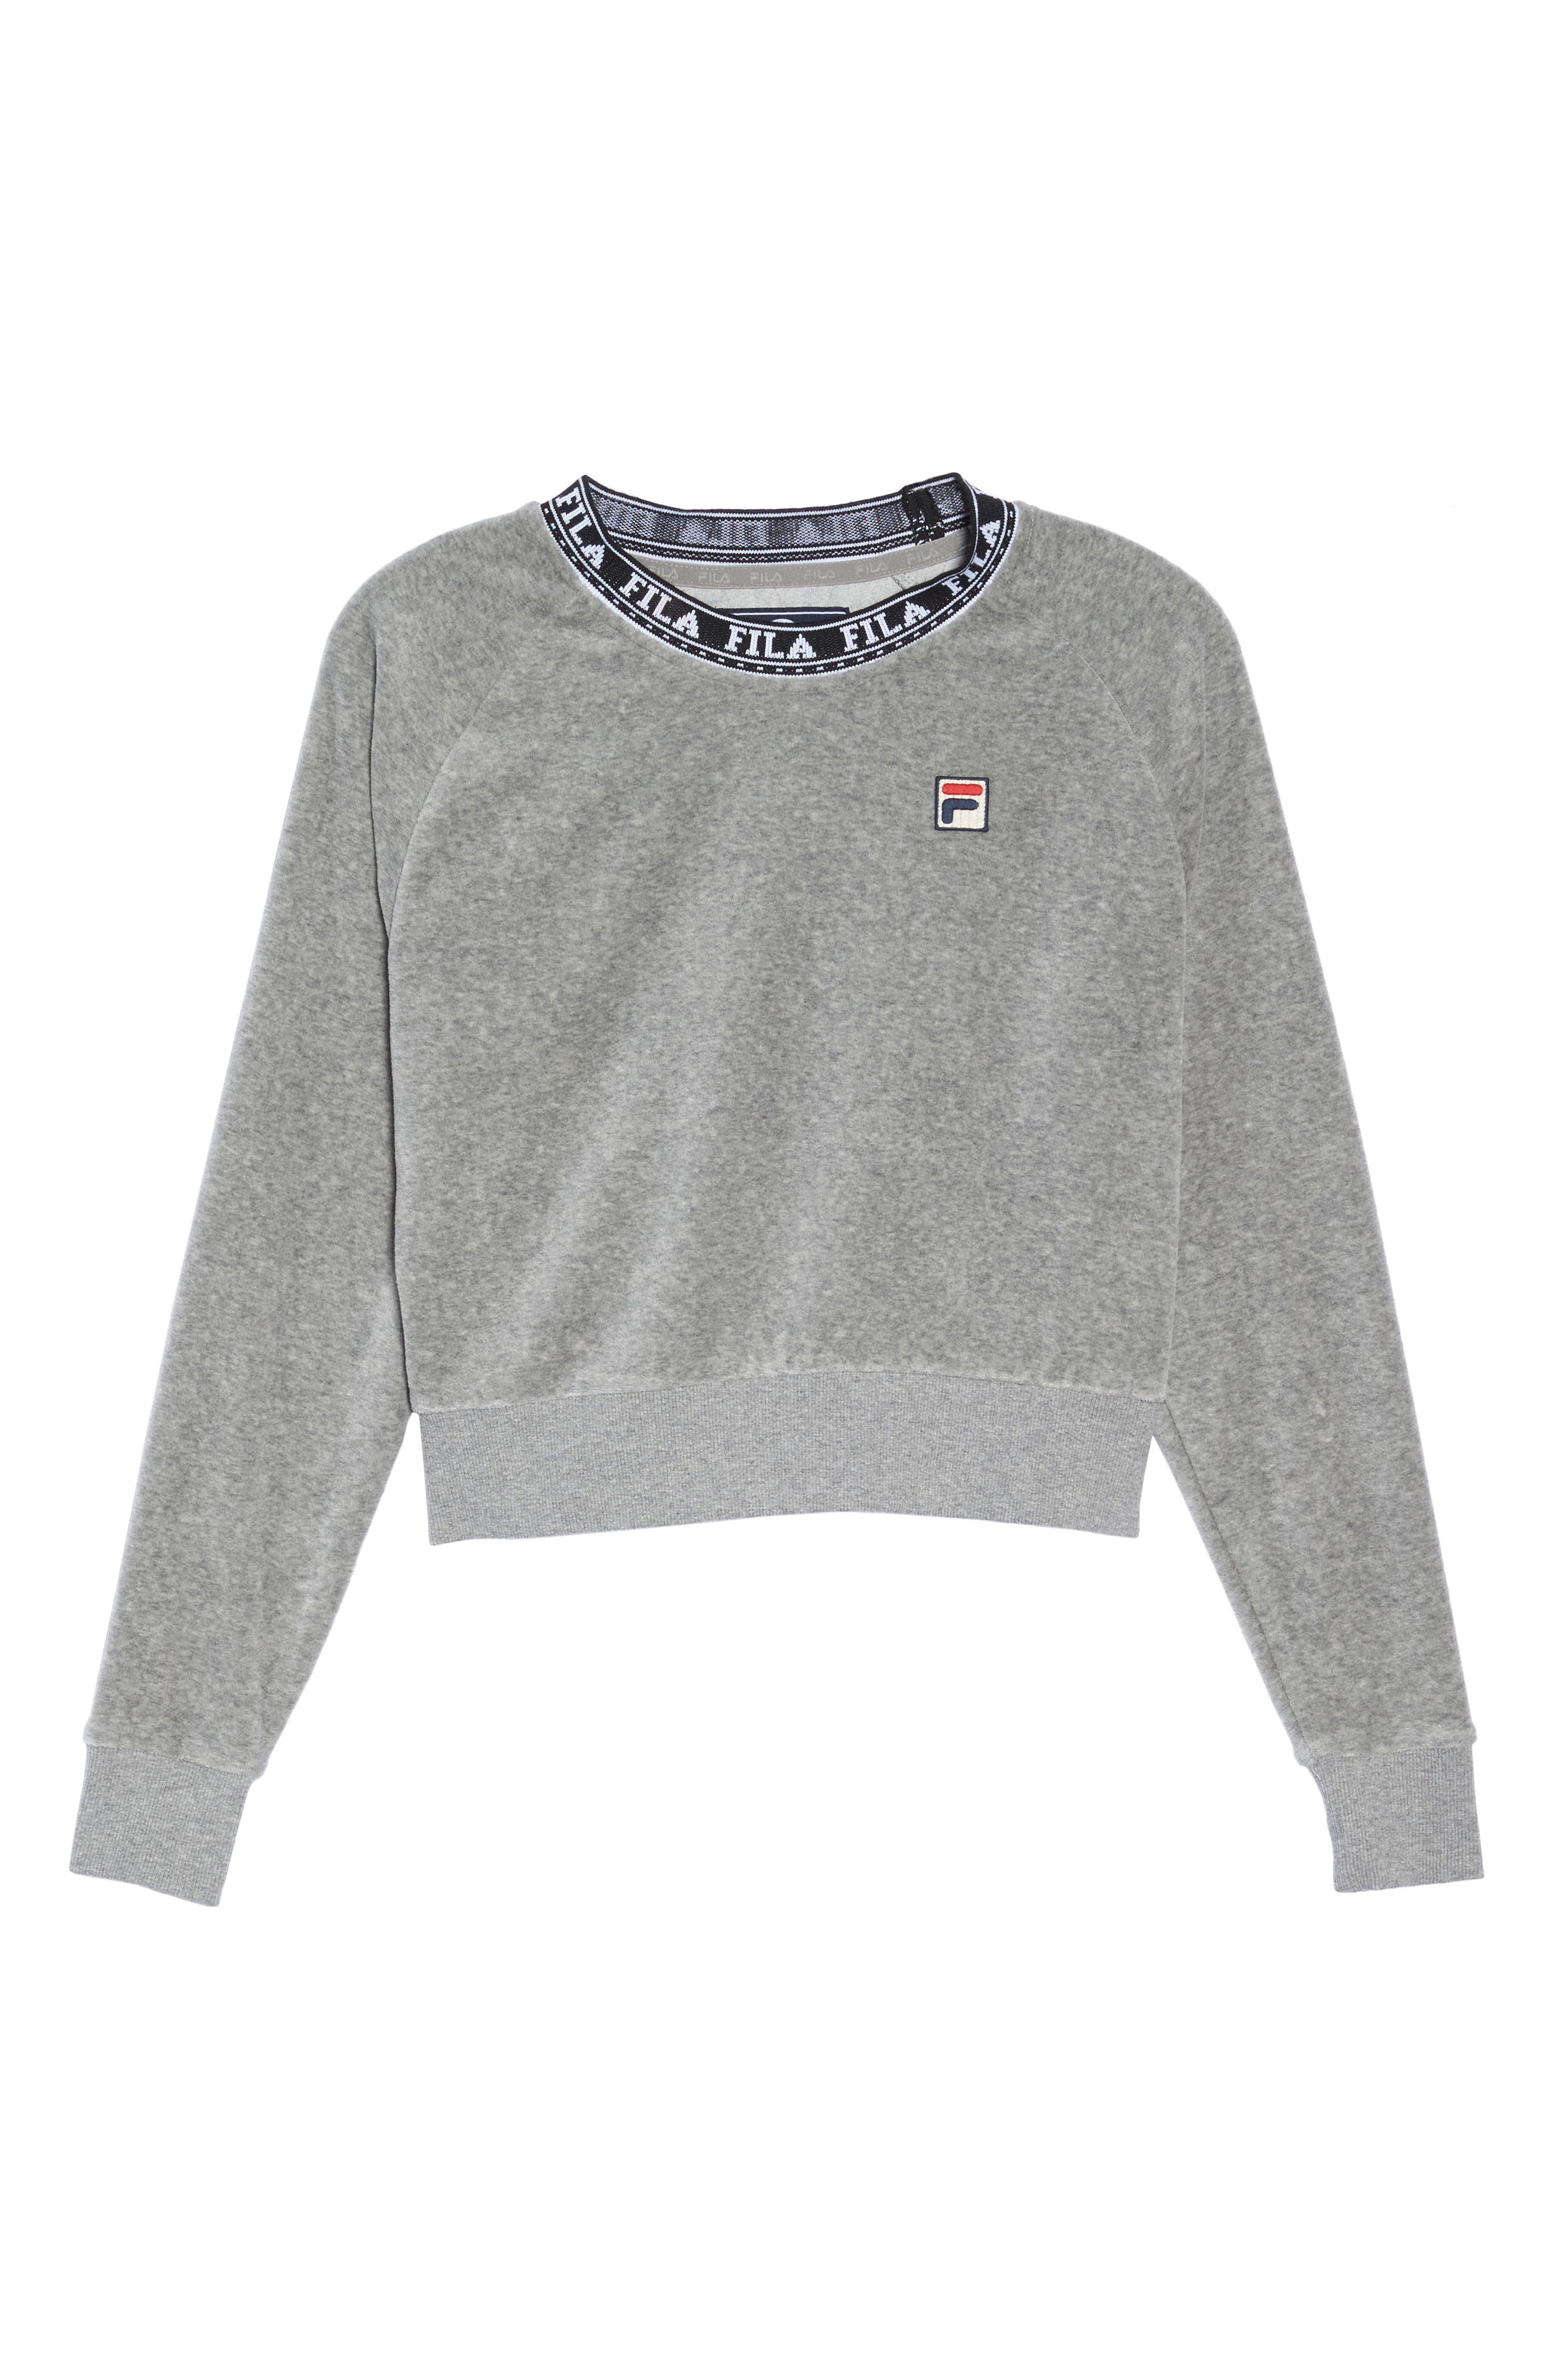 Dina Velour Crop Sweatshirt,                             Alternate thumbnail 7, color,                             Grey Heather/ Black/ White